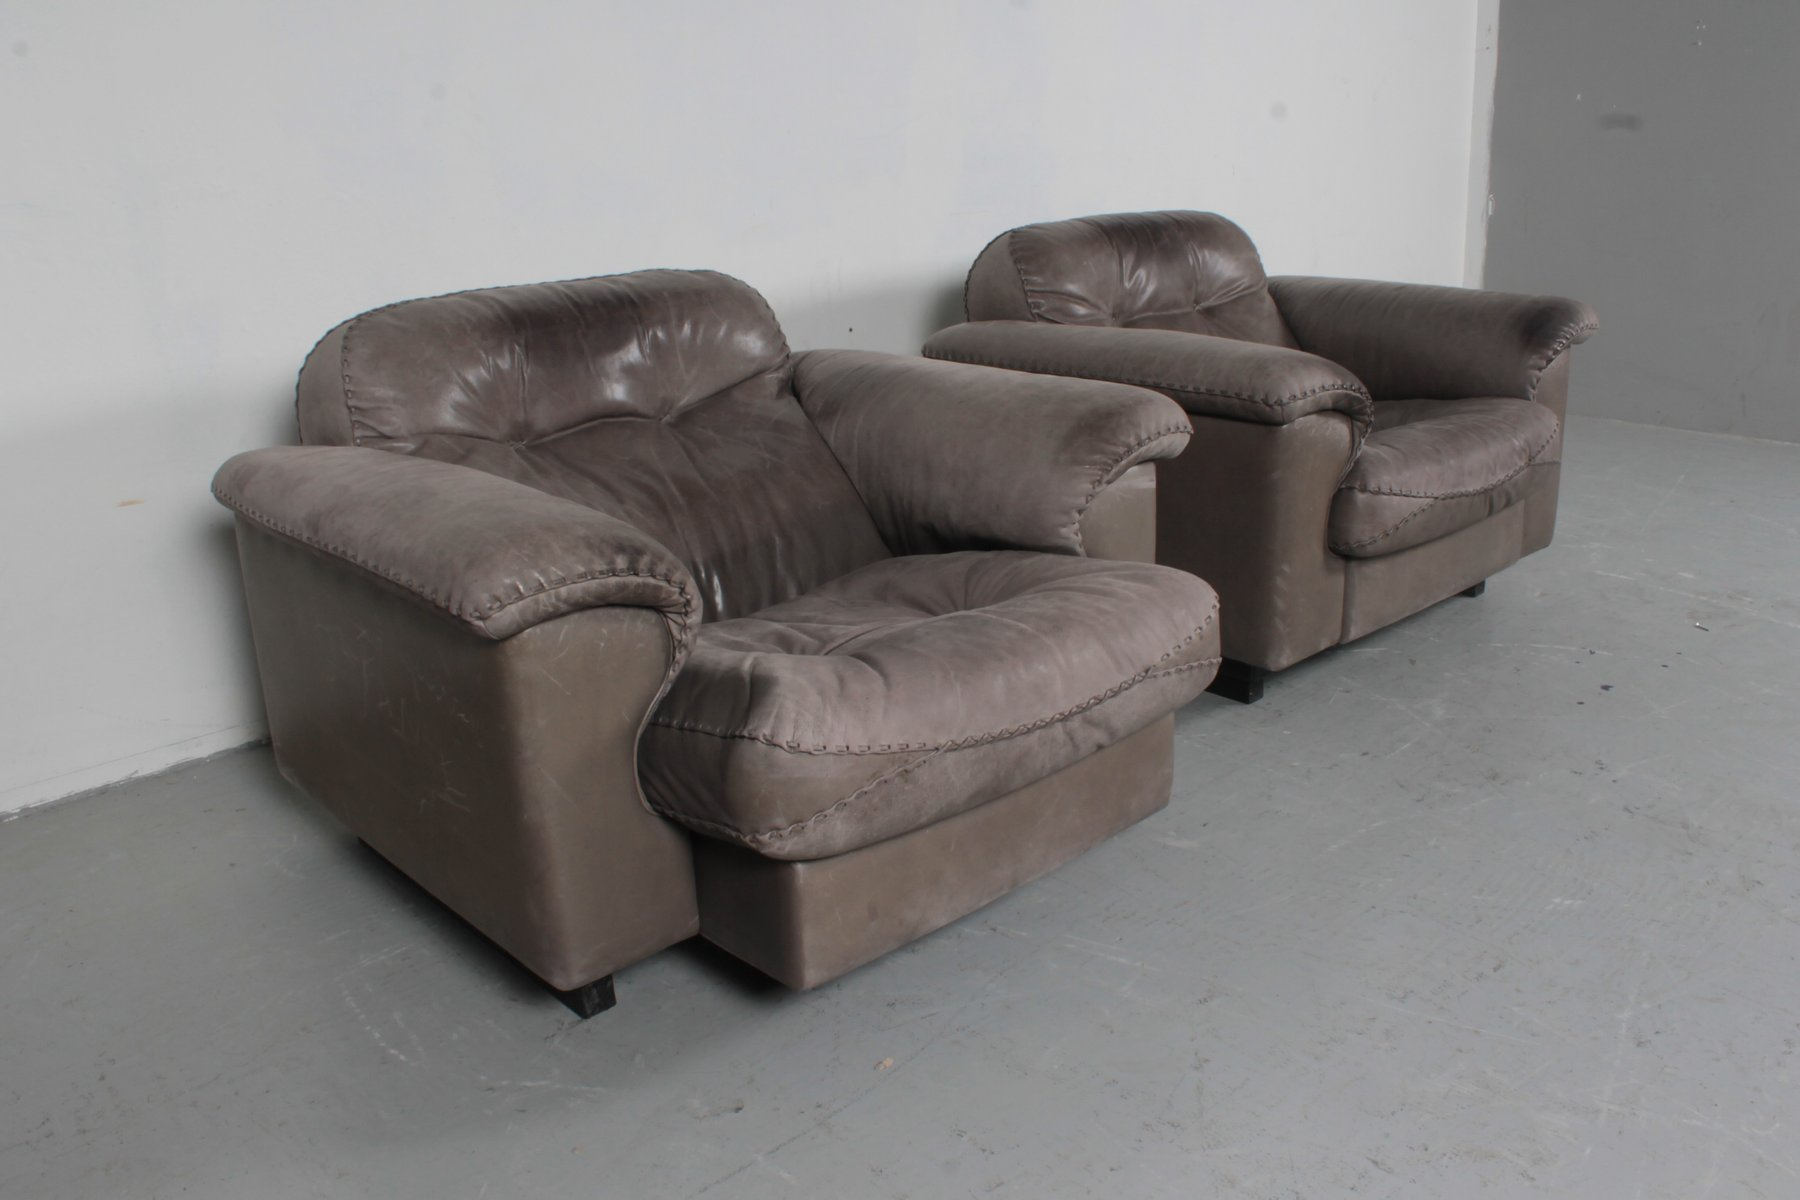 ds101 sessel von de sede 1970er bei pamono kaufen. Black Bedroom Furniture Sets. Home Design Ideas